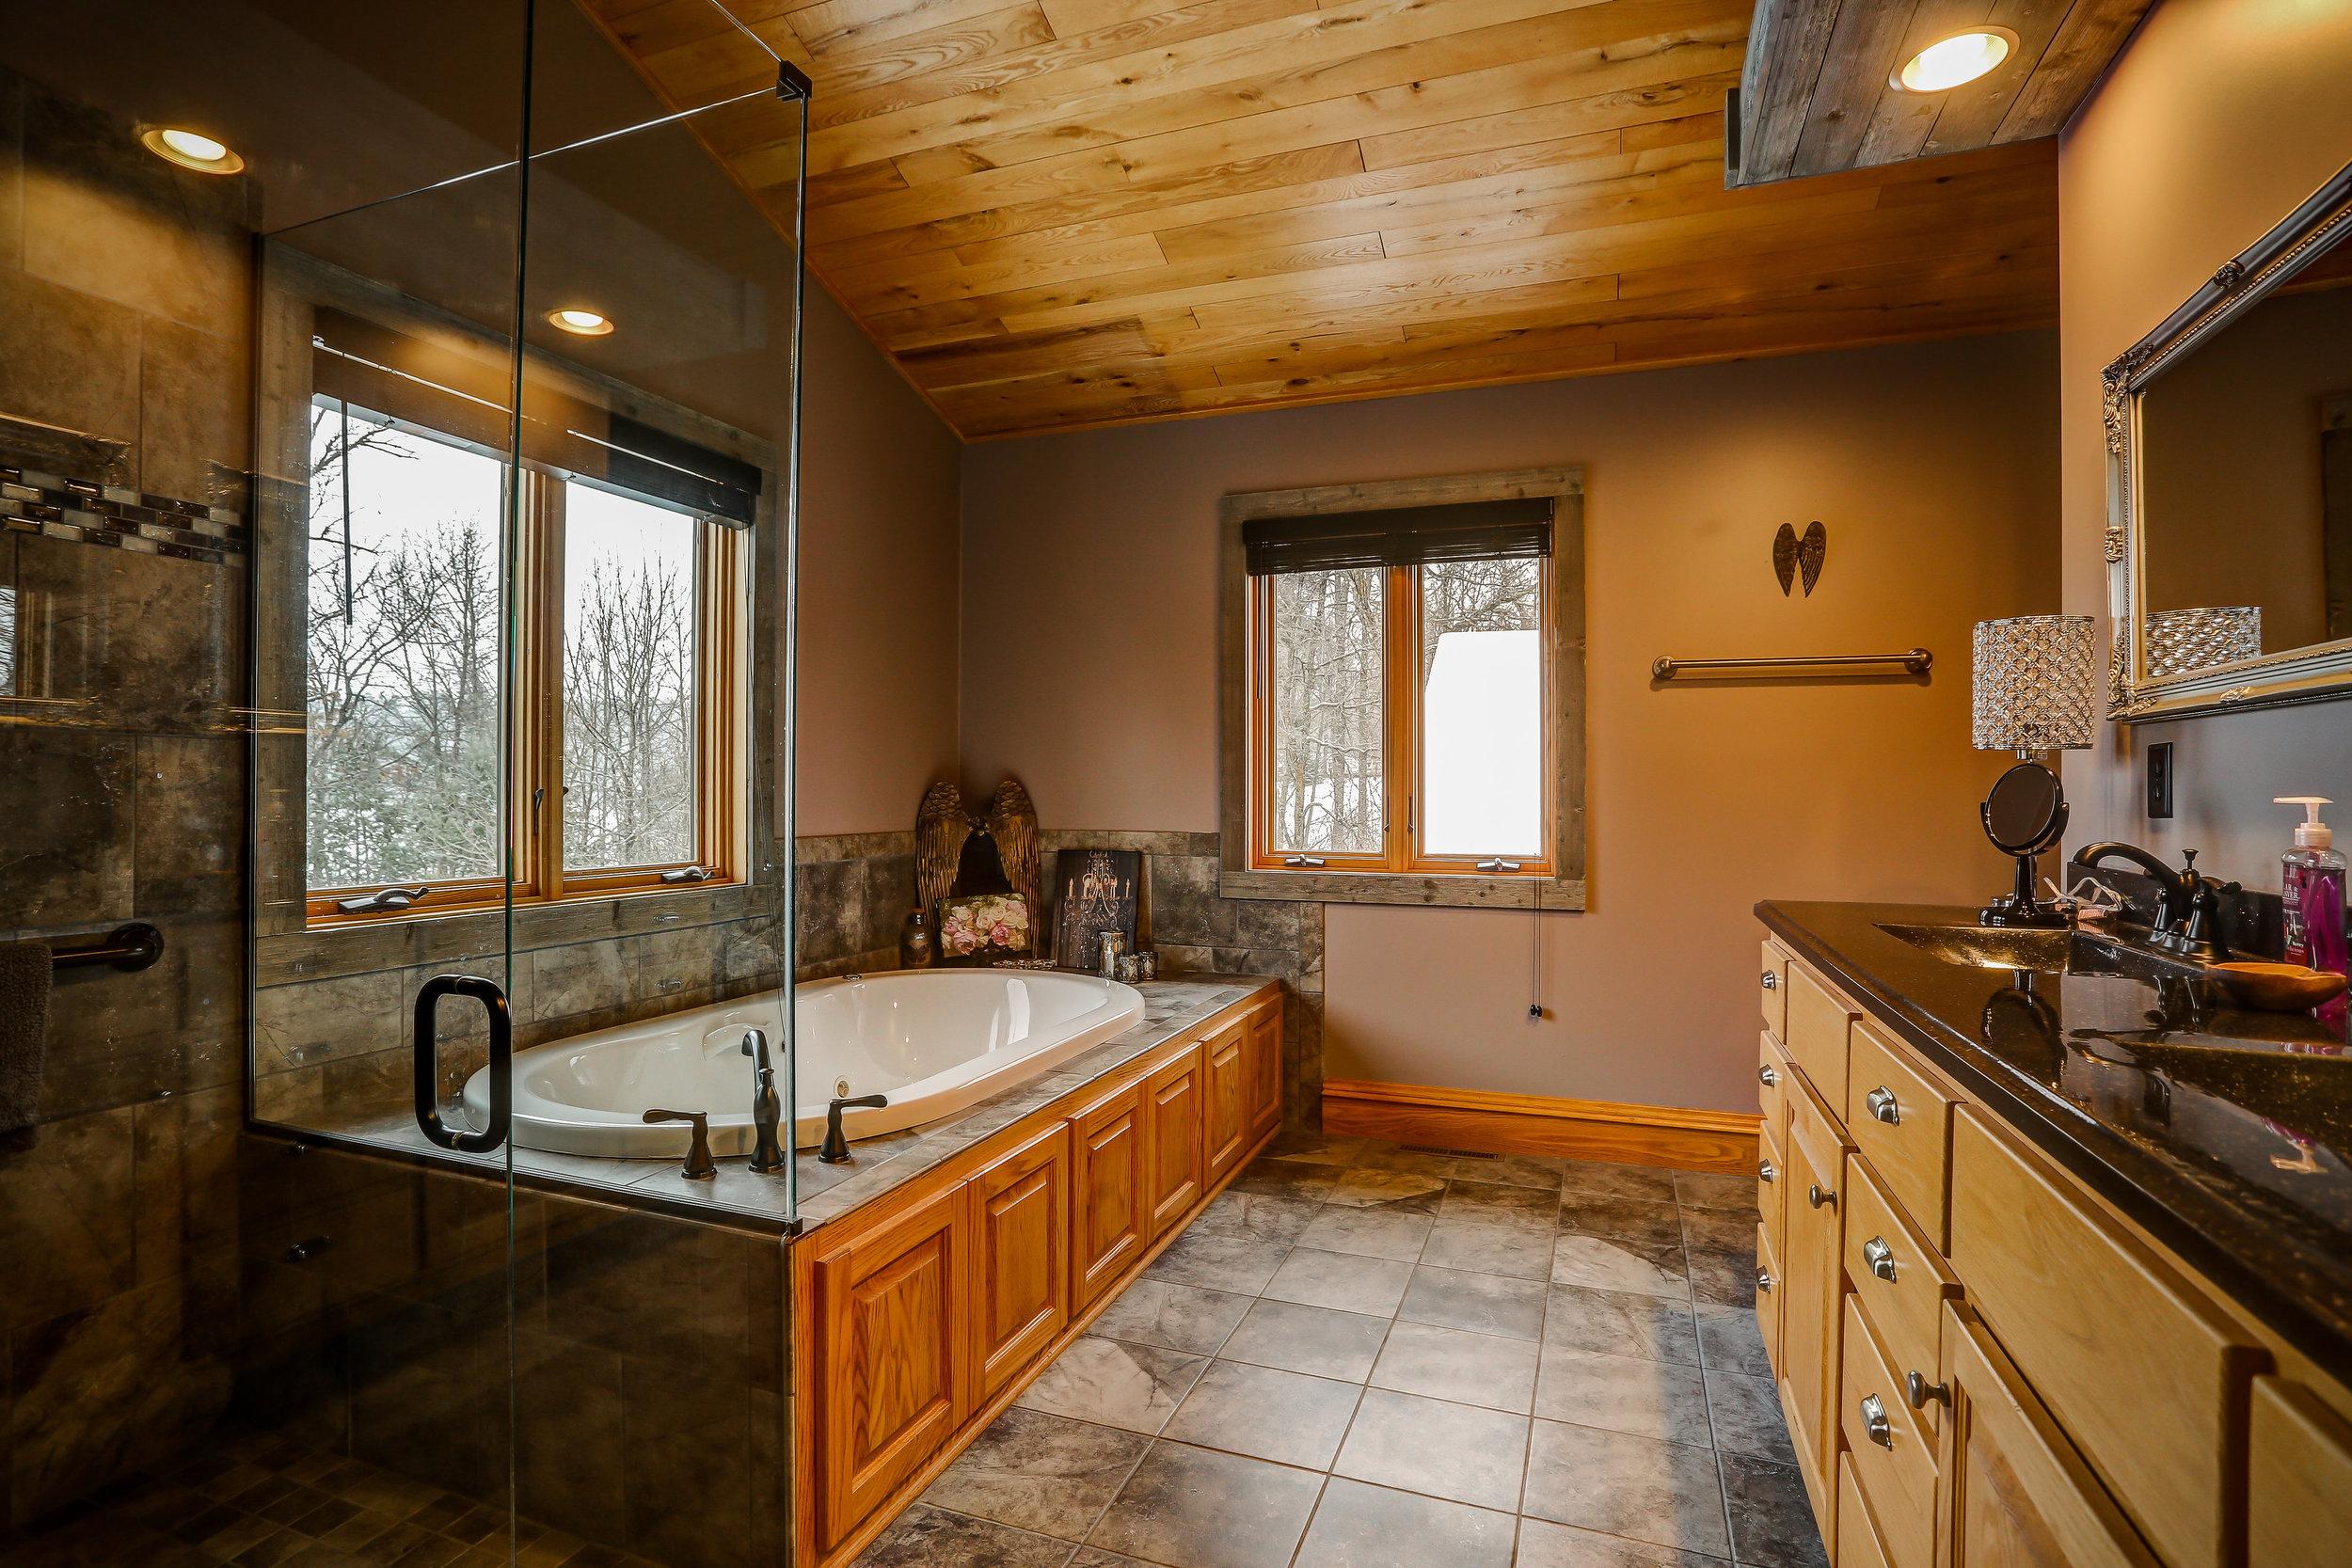 Upstairs Master Ensuite Bath - Upstairs | Full Ensuite Master Bathroom